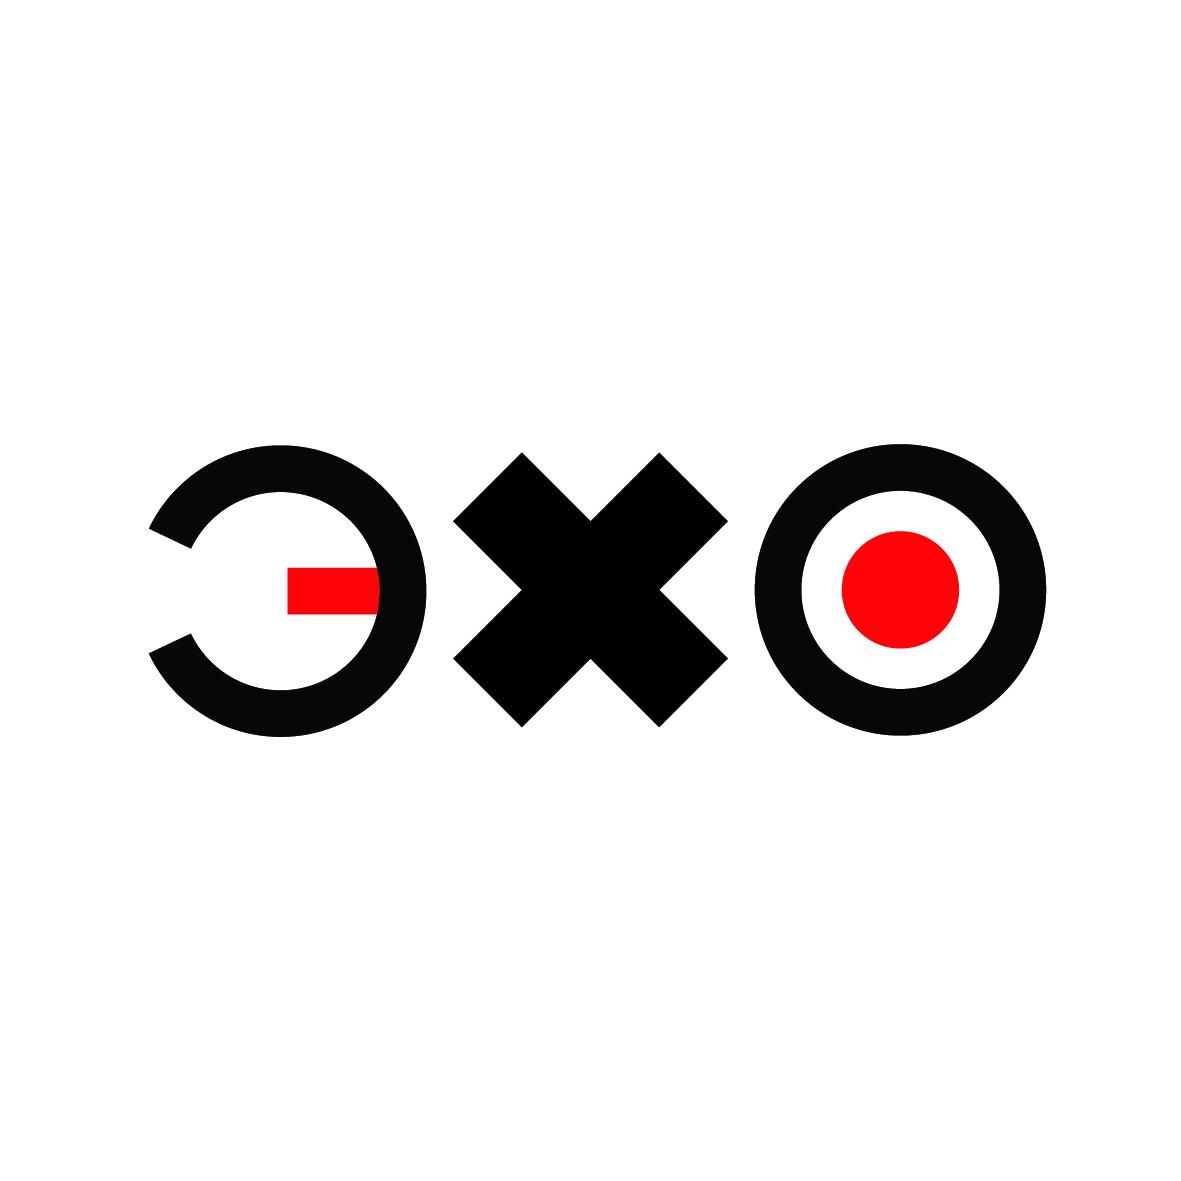 Дизайн логотипа р/с Эхо Москвы. фото f_5915620c9cdd0c7f.jpg